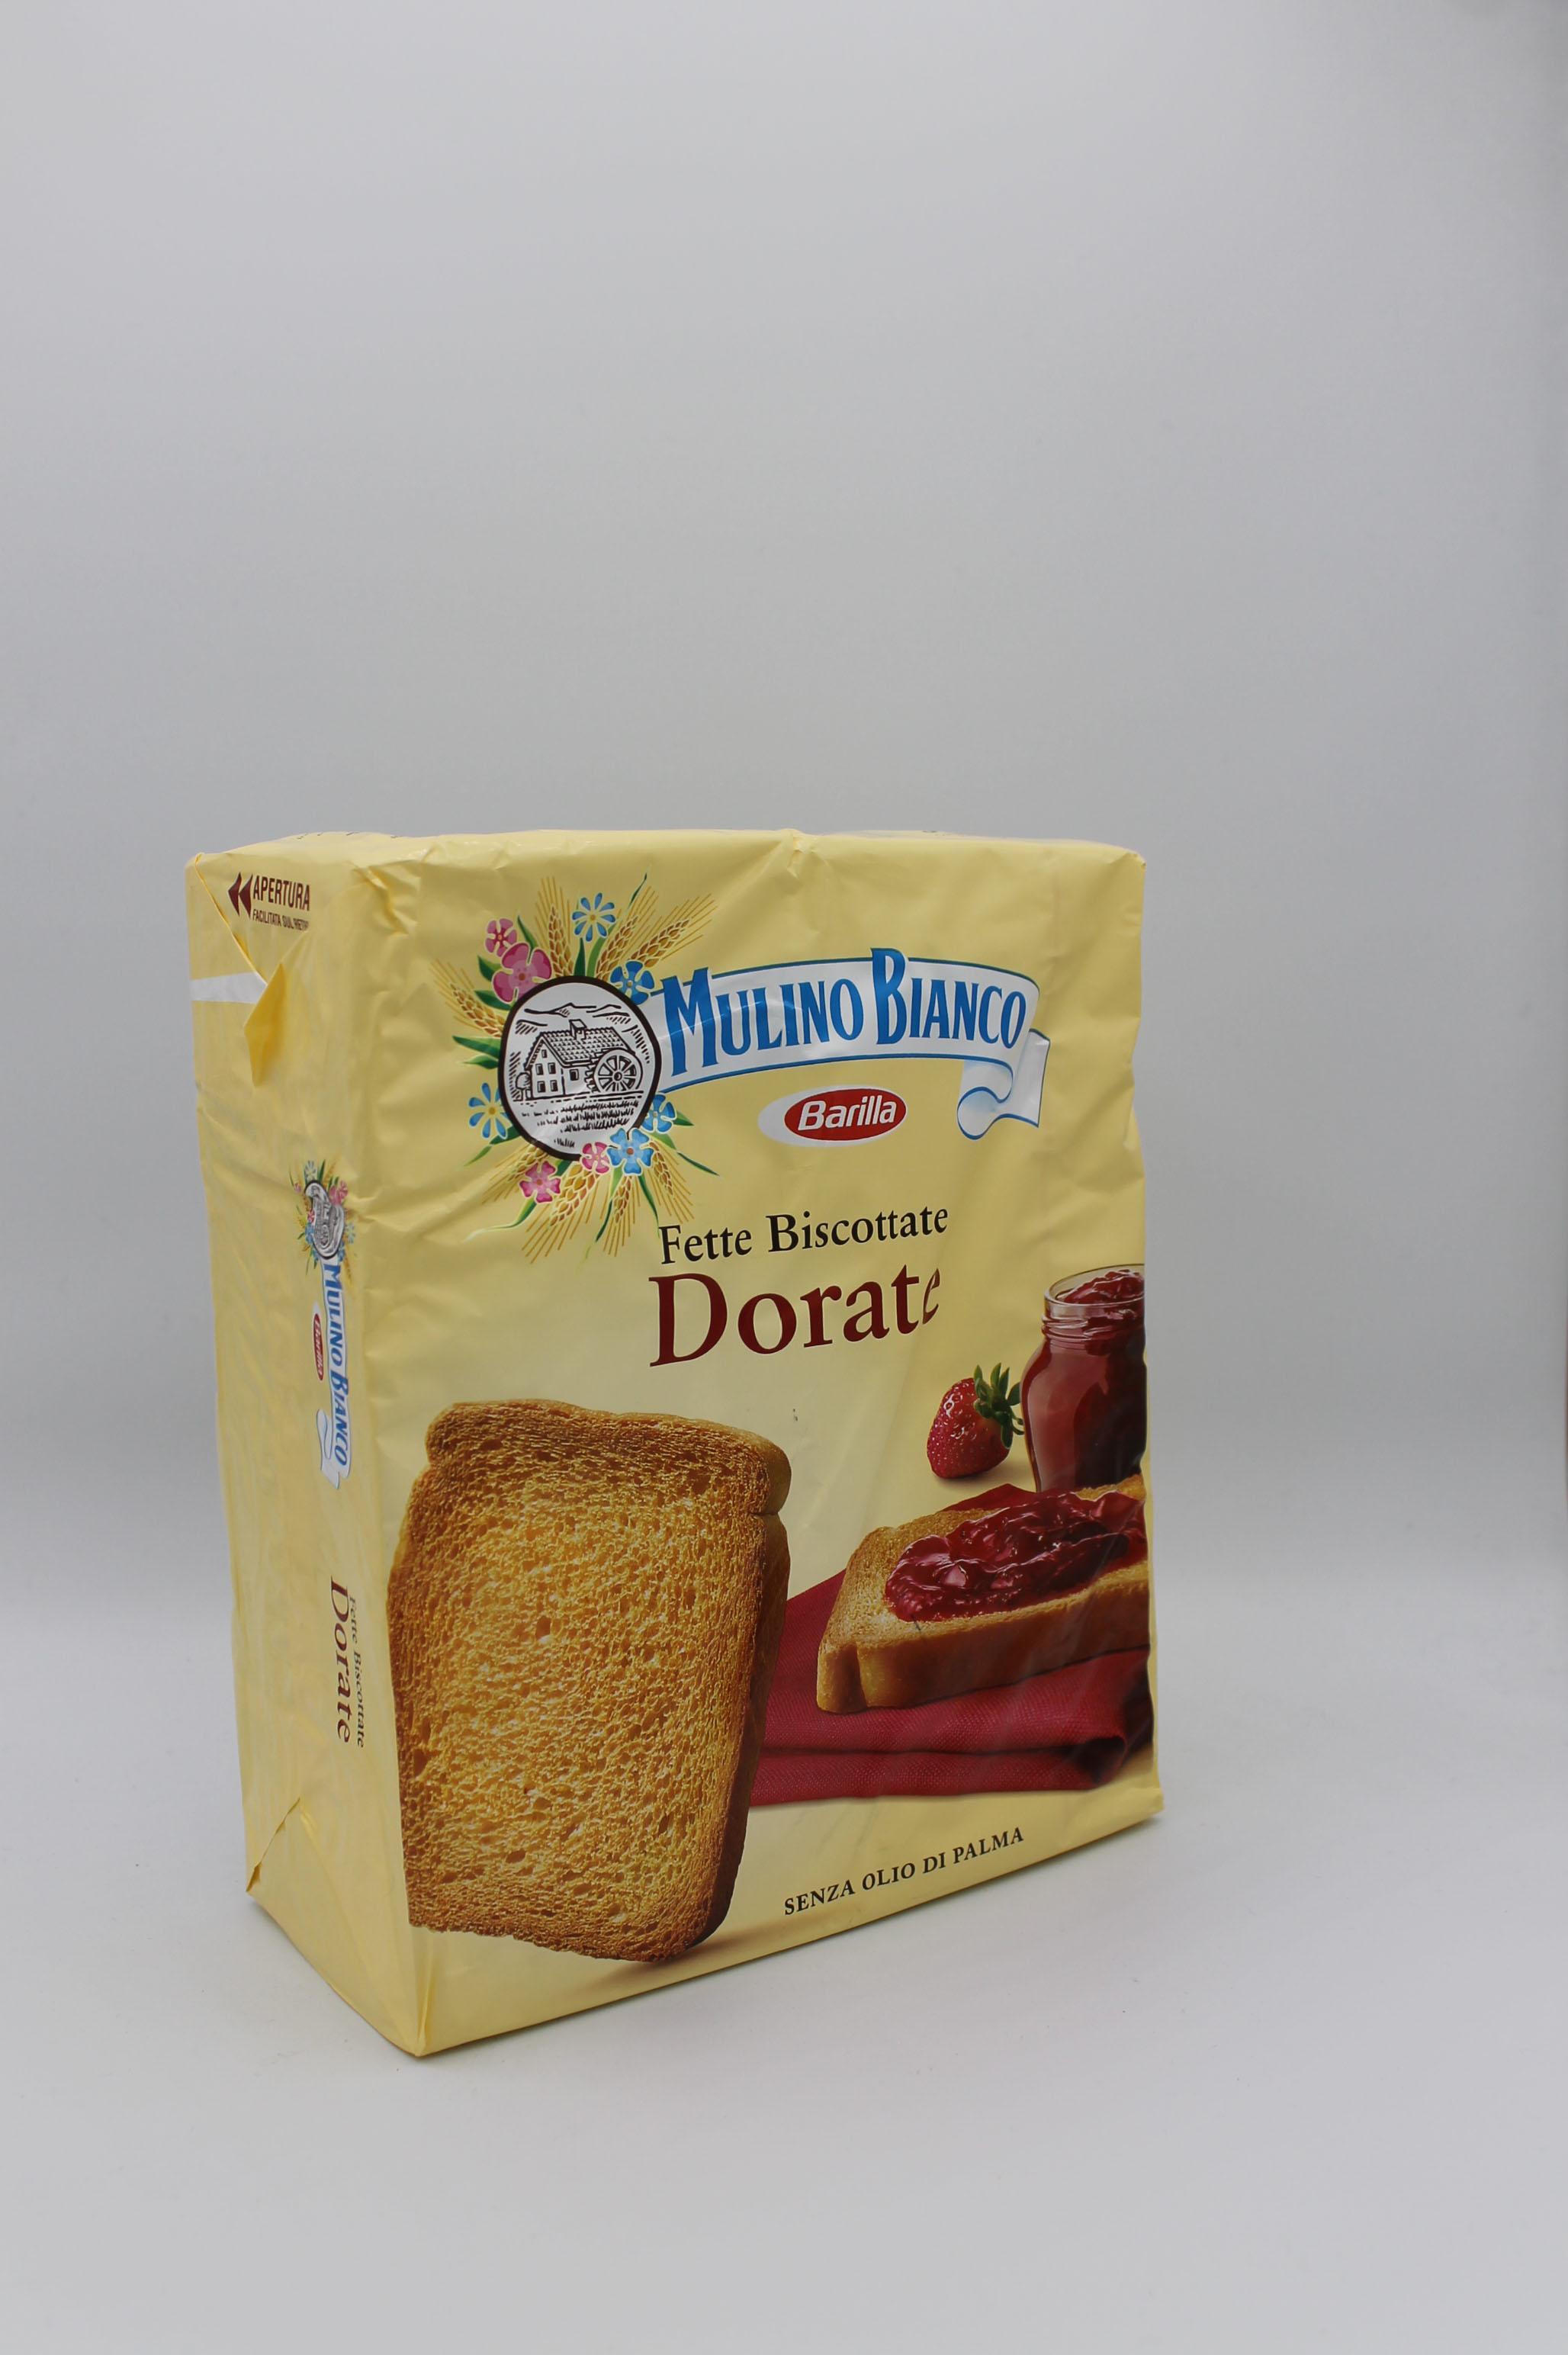 Mulino bianco fette biscottate 315 gr vari gusti.